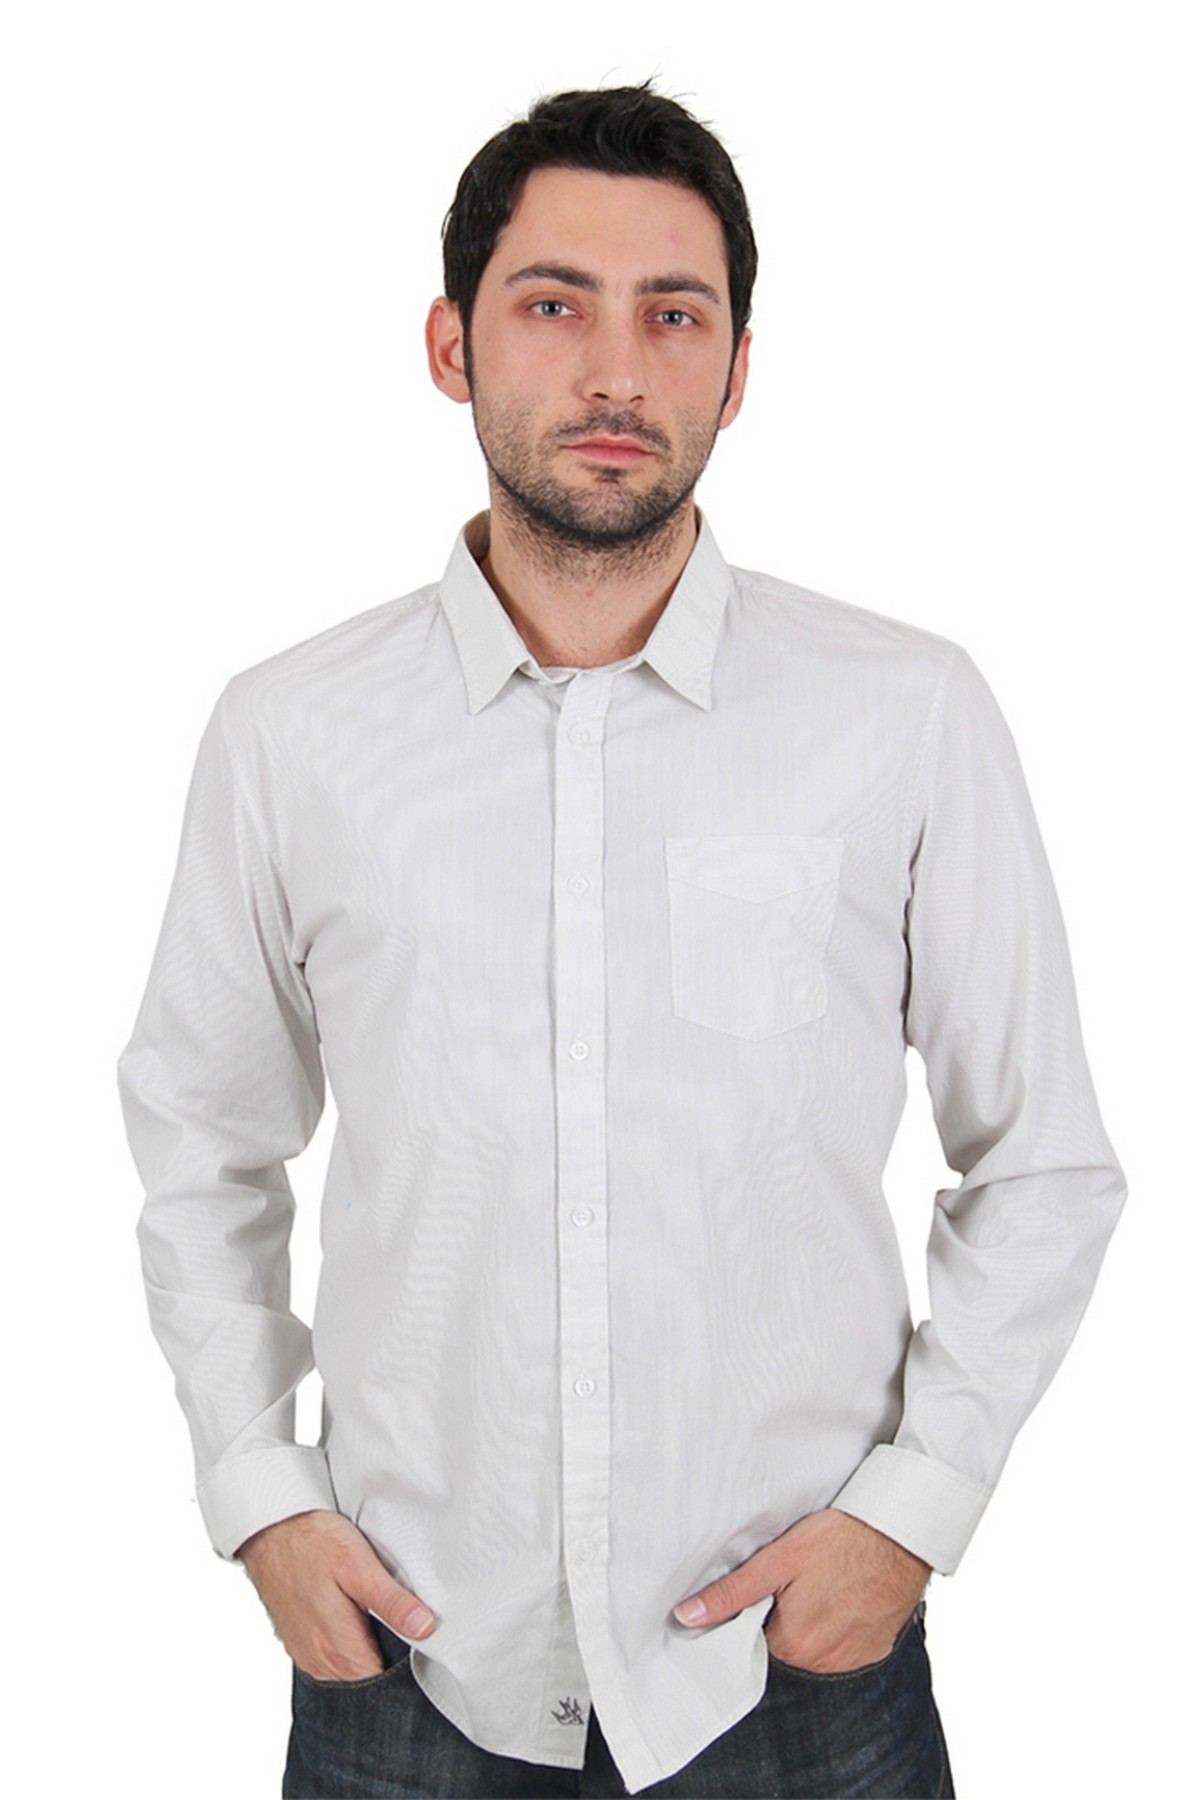 Quiksilver Erkek Gömlek Beyaz (KGMSH083)